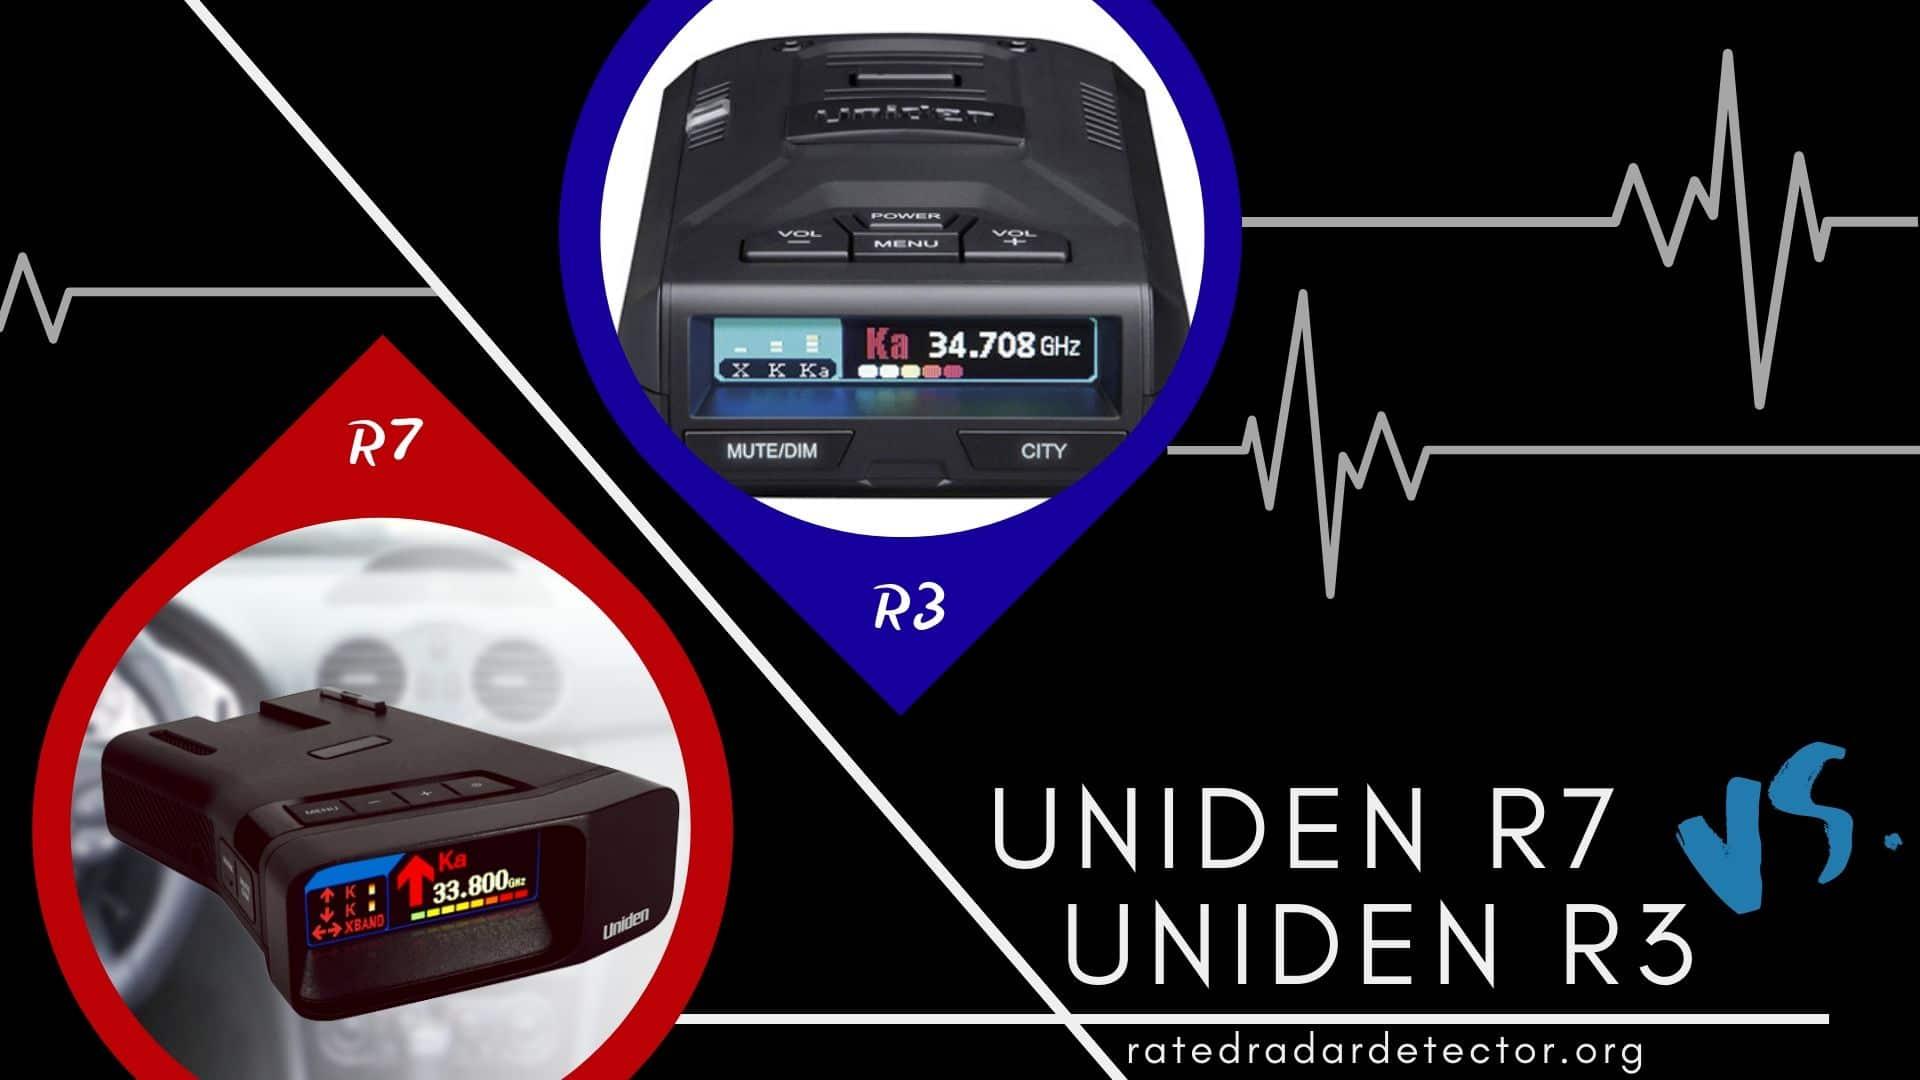 Uniden R7 vs Uniden R3